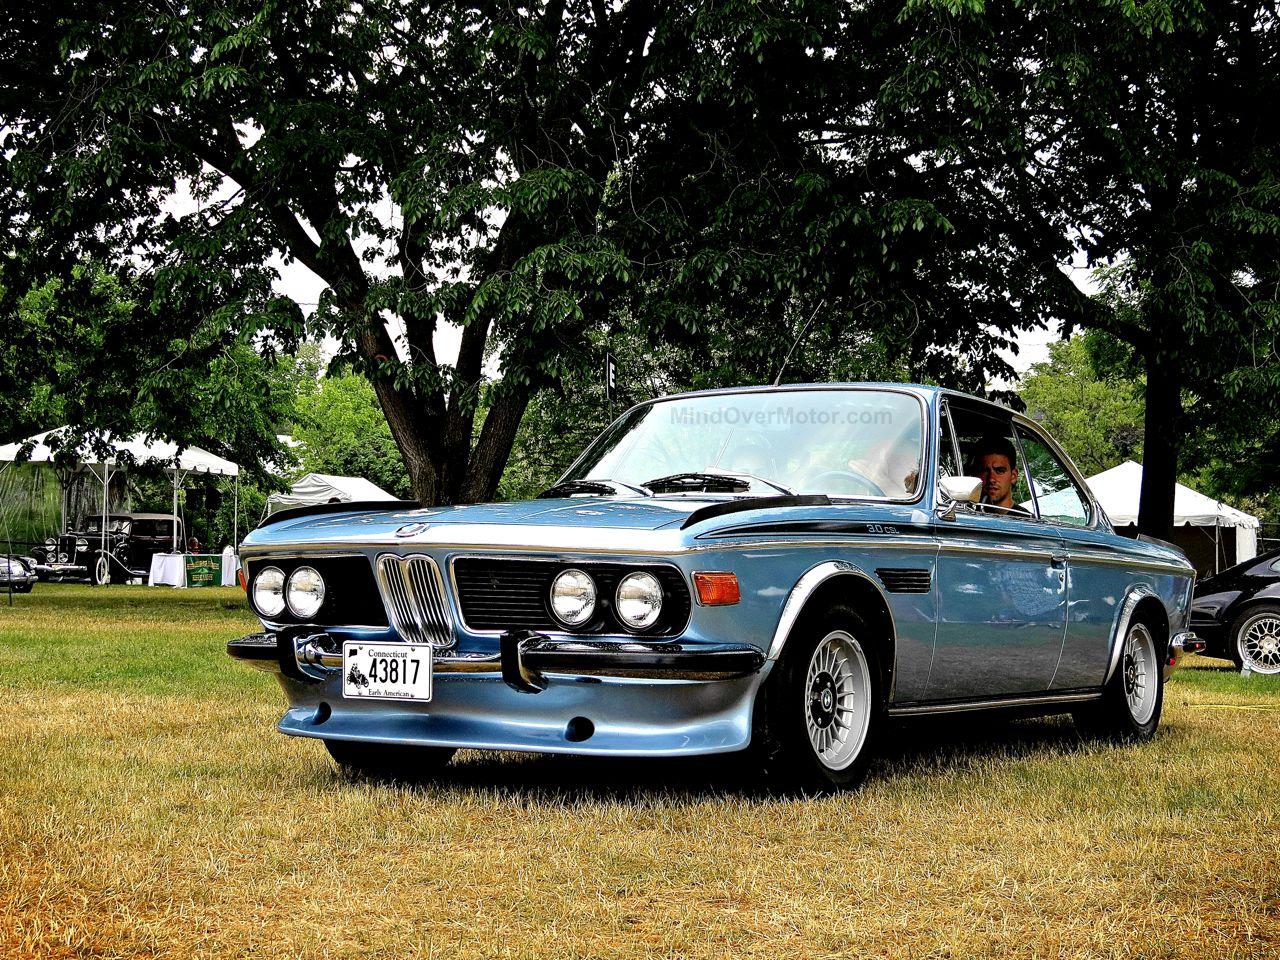 Greenwich 2 BMW E9 3.0 CSL